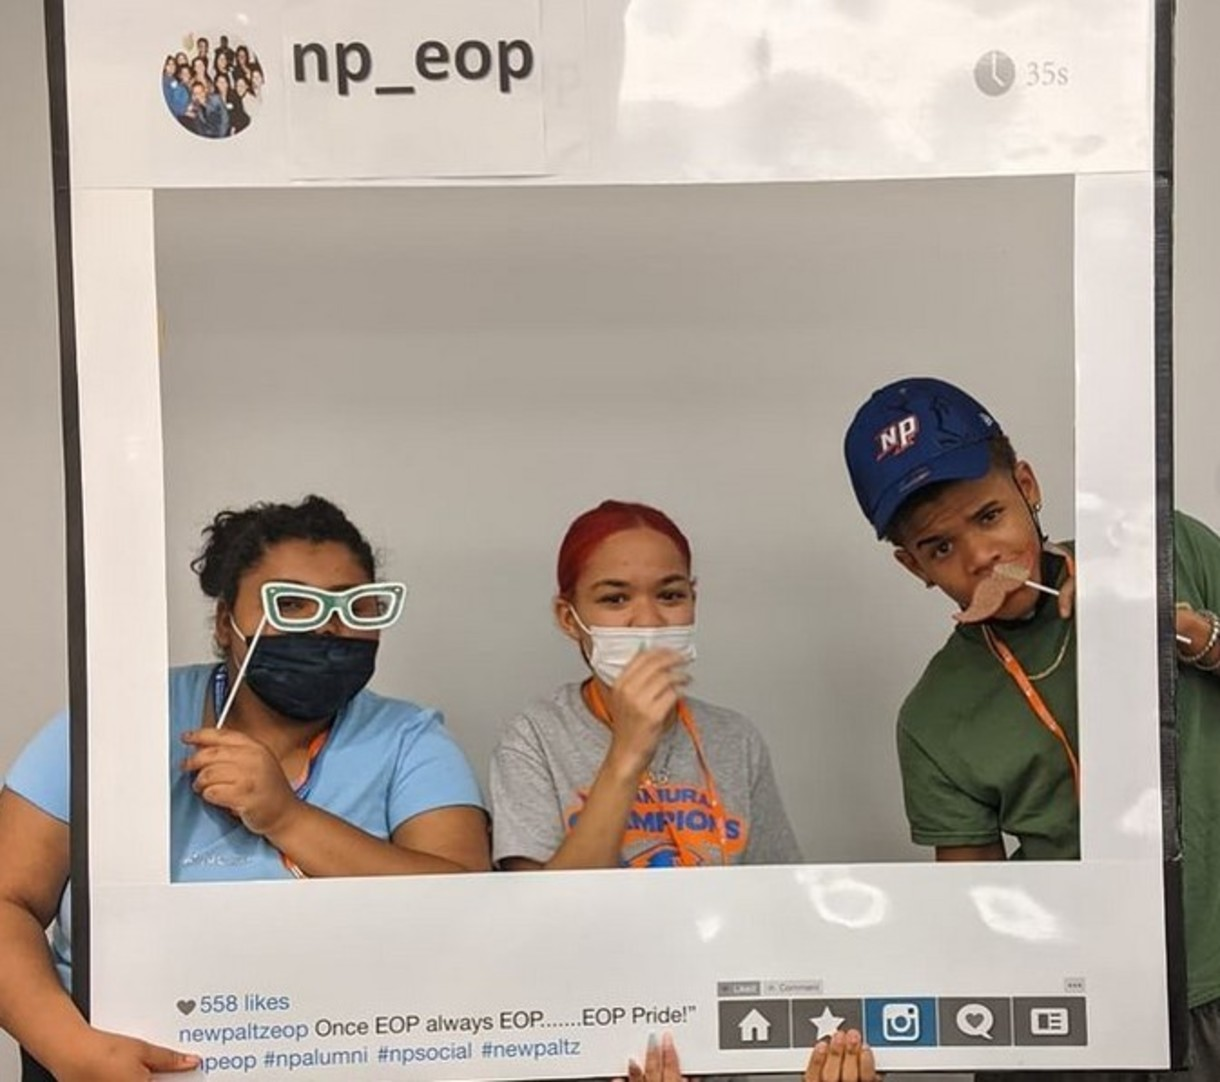 New Paltz EOP on Instagram